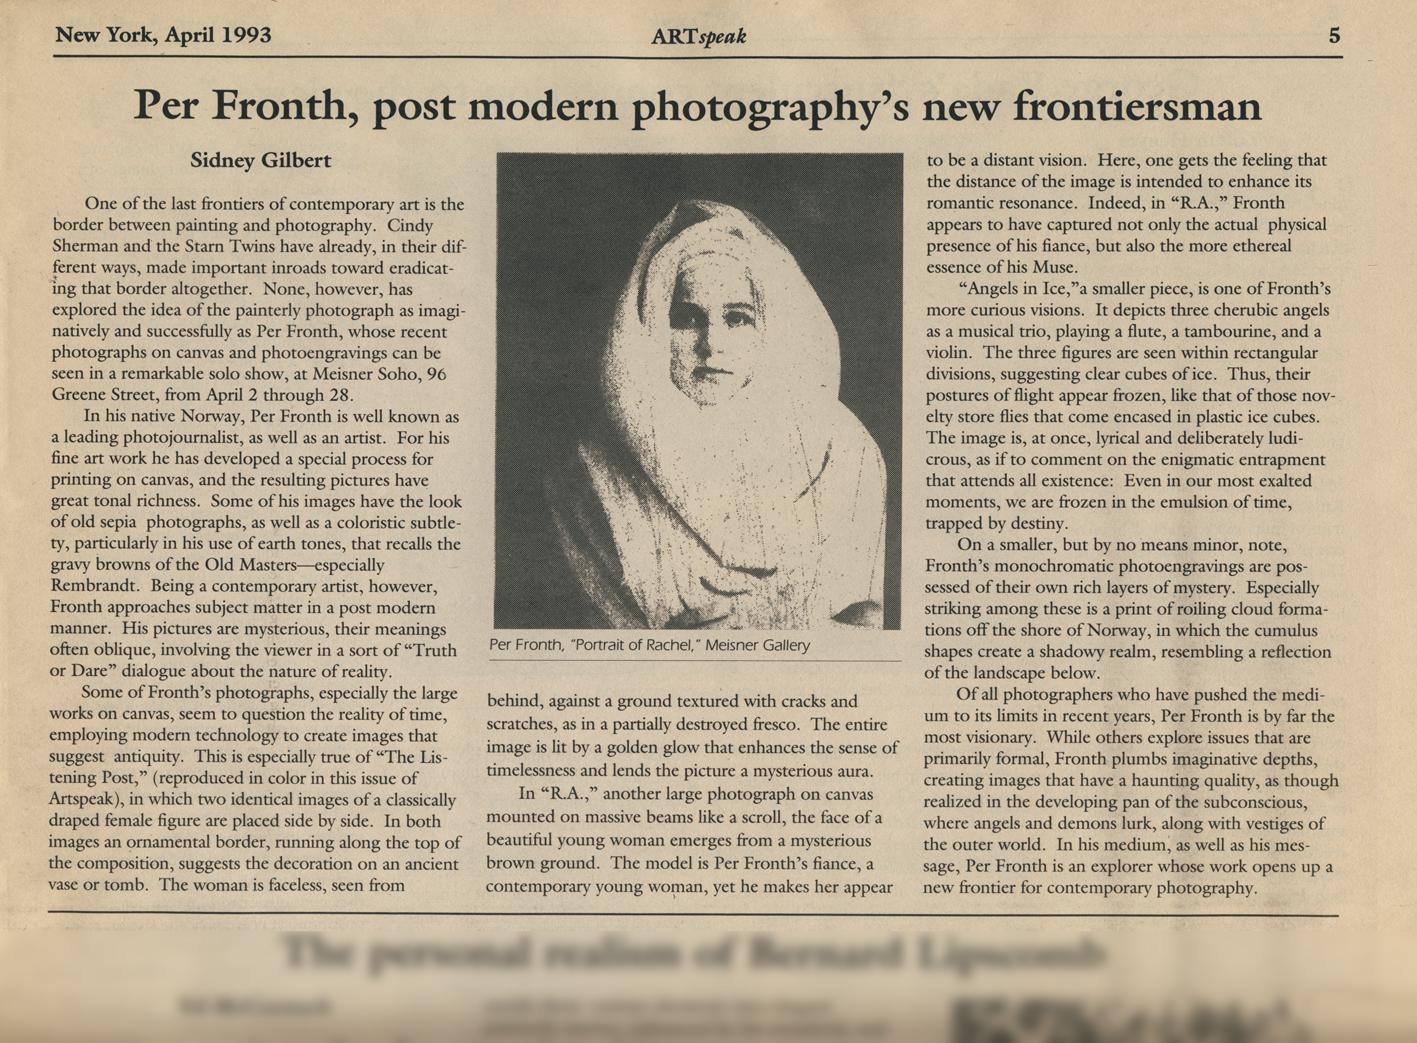 ARTspeak.april1993.jpg